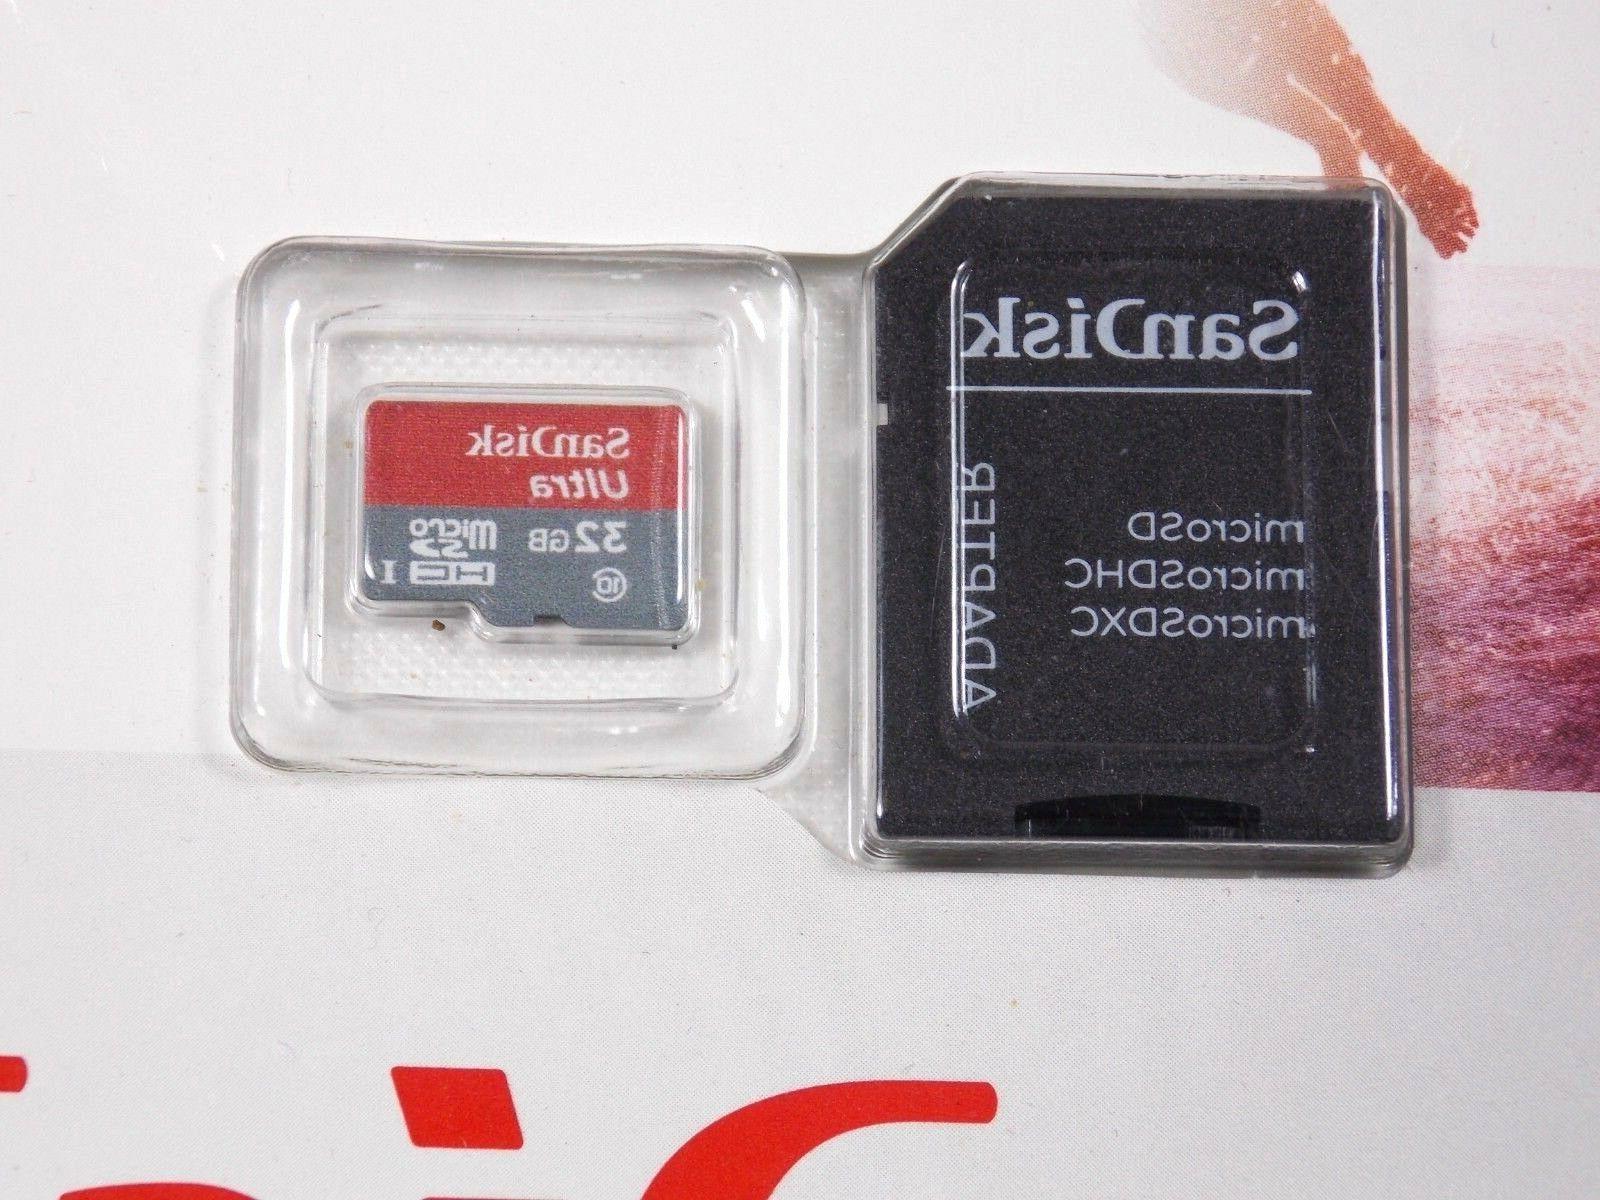 SANDISK ULTRA 32GB SD UHS-I 2 SEALED